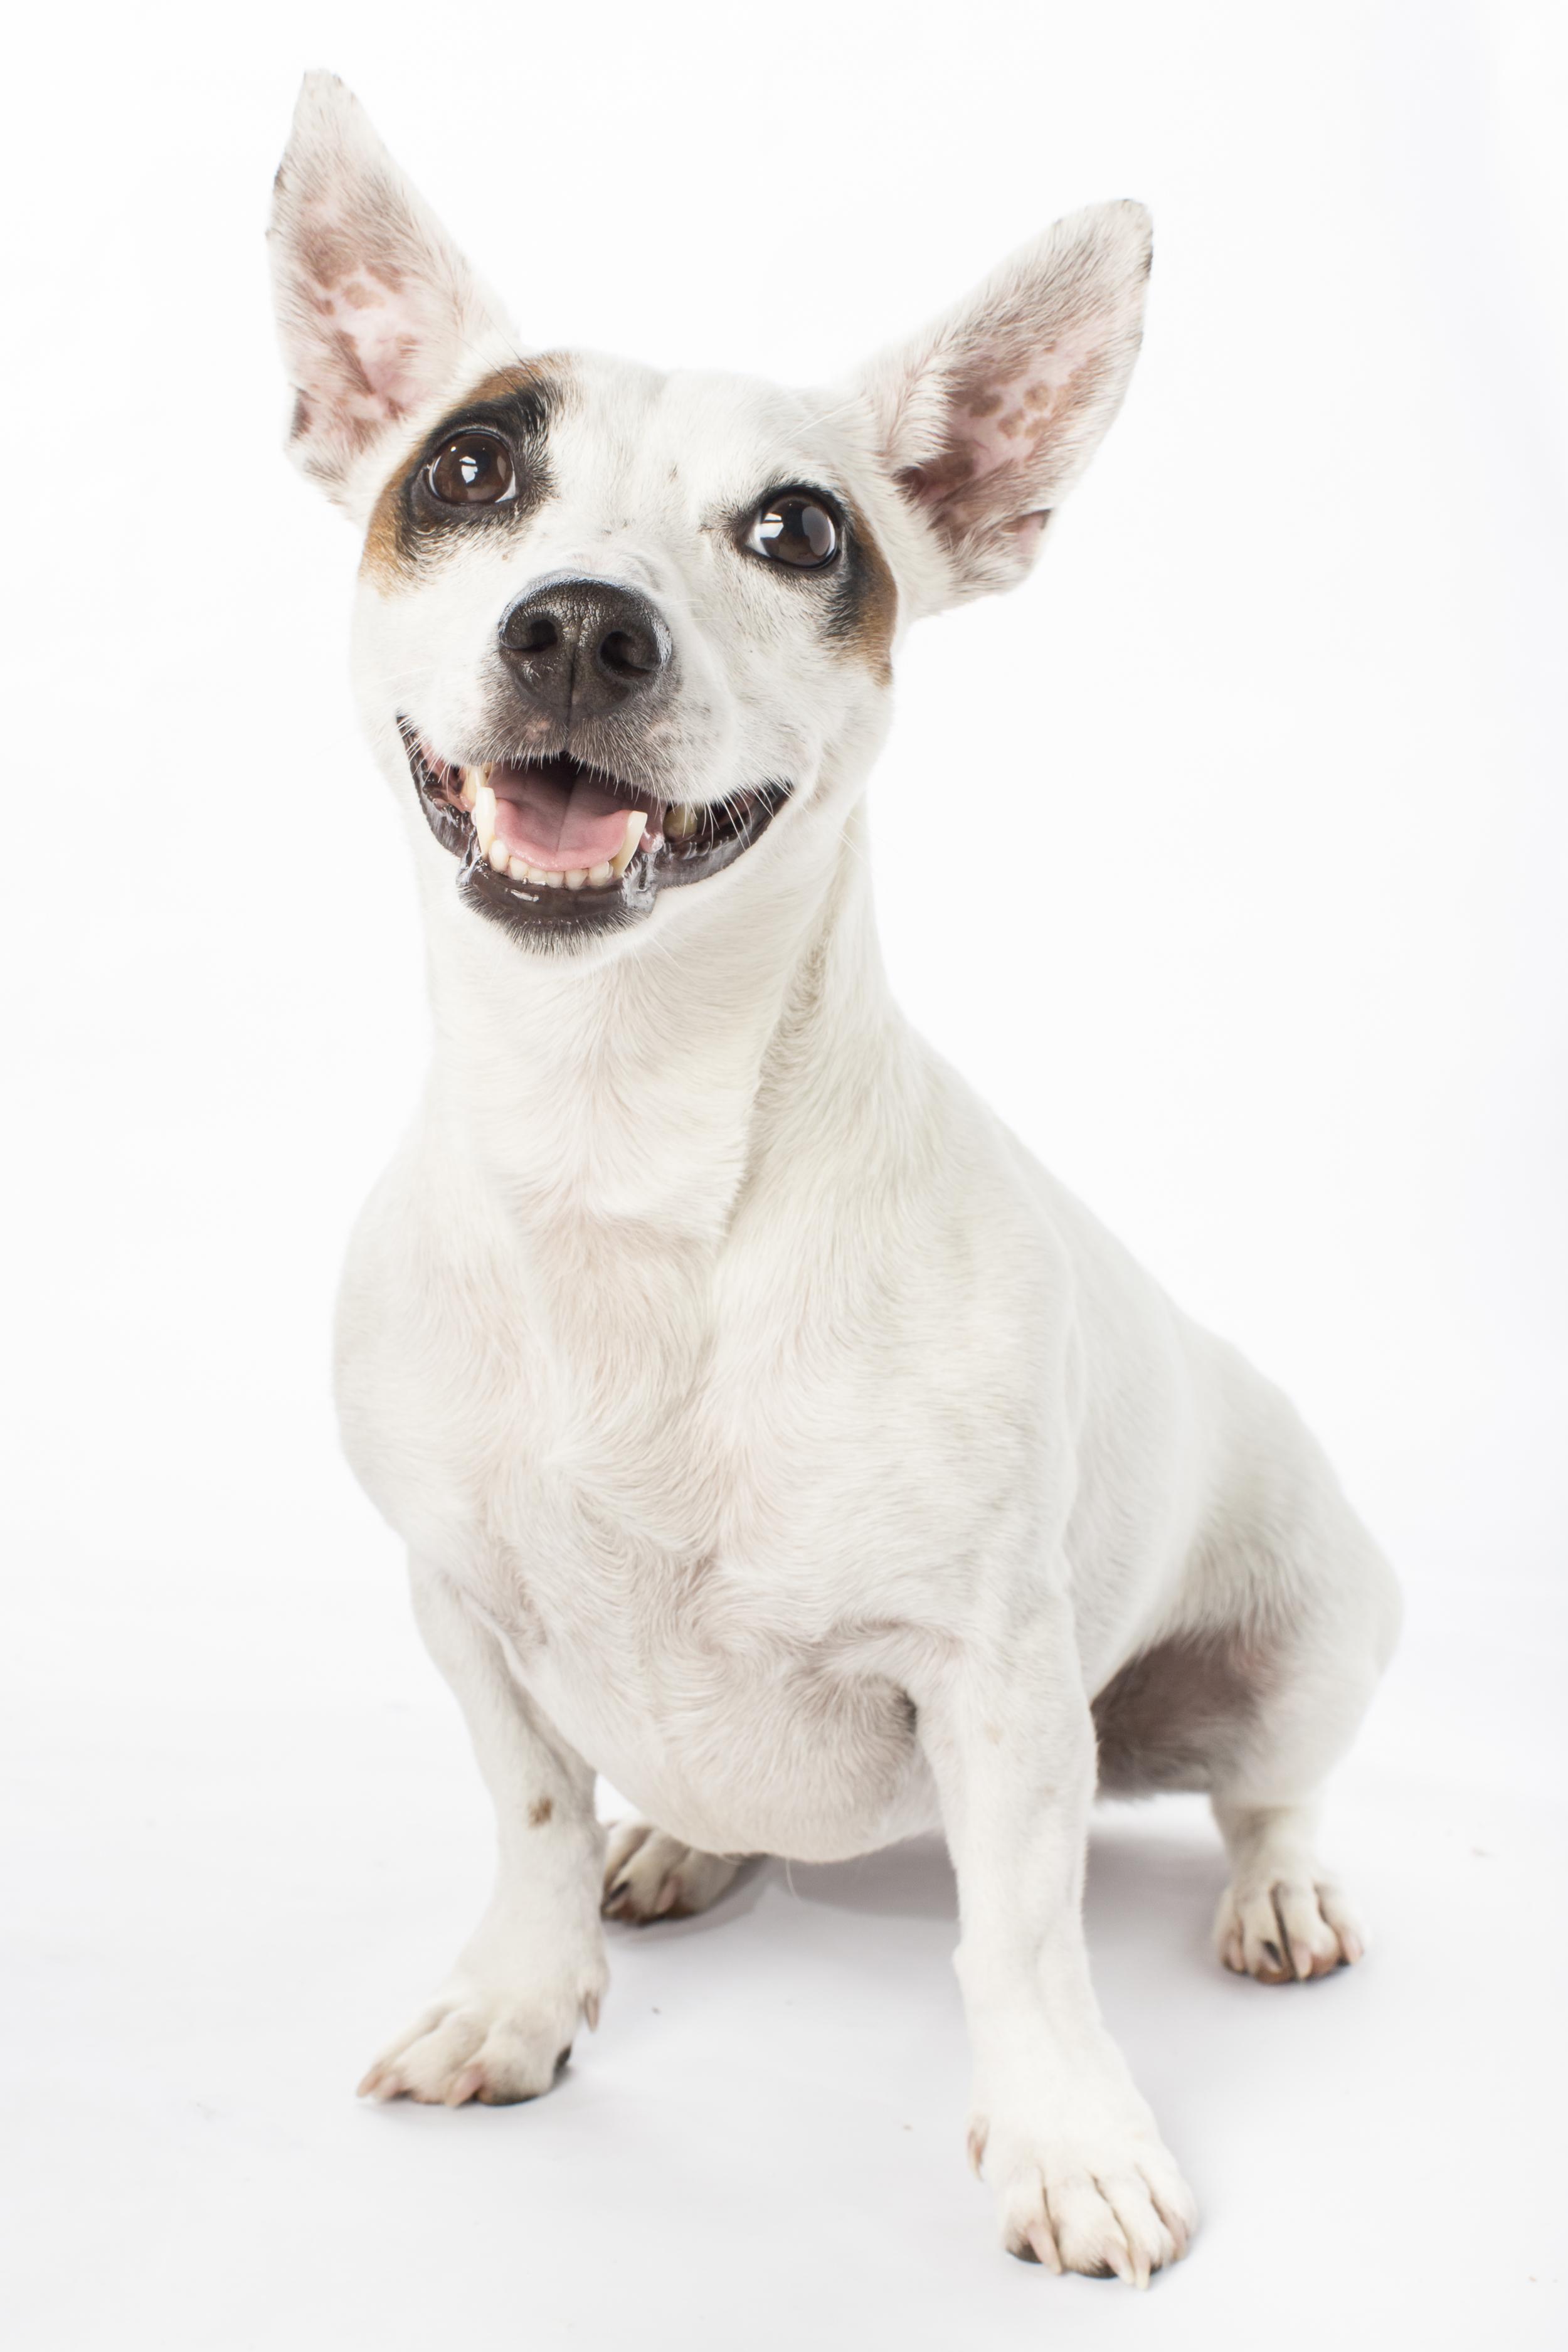 43 Tan eye patch white dog sitting studio pet photography session on white.jpg